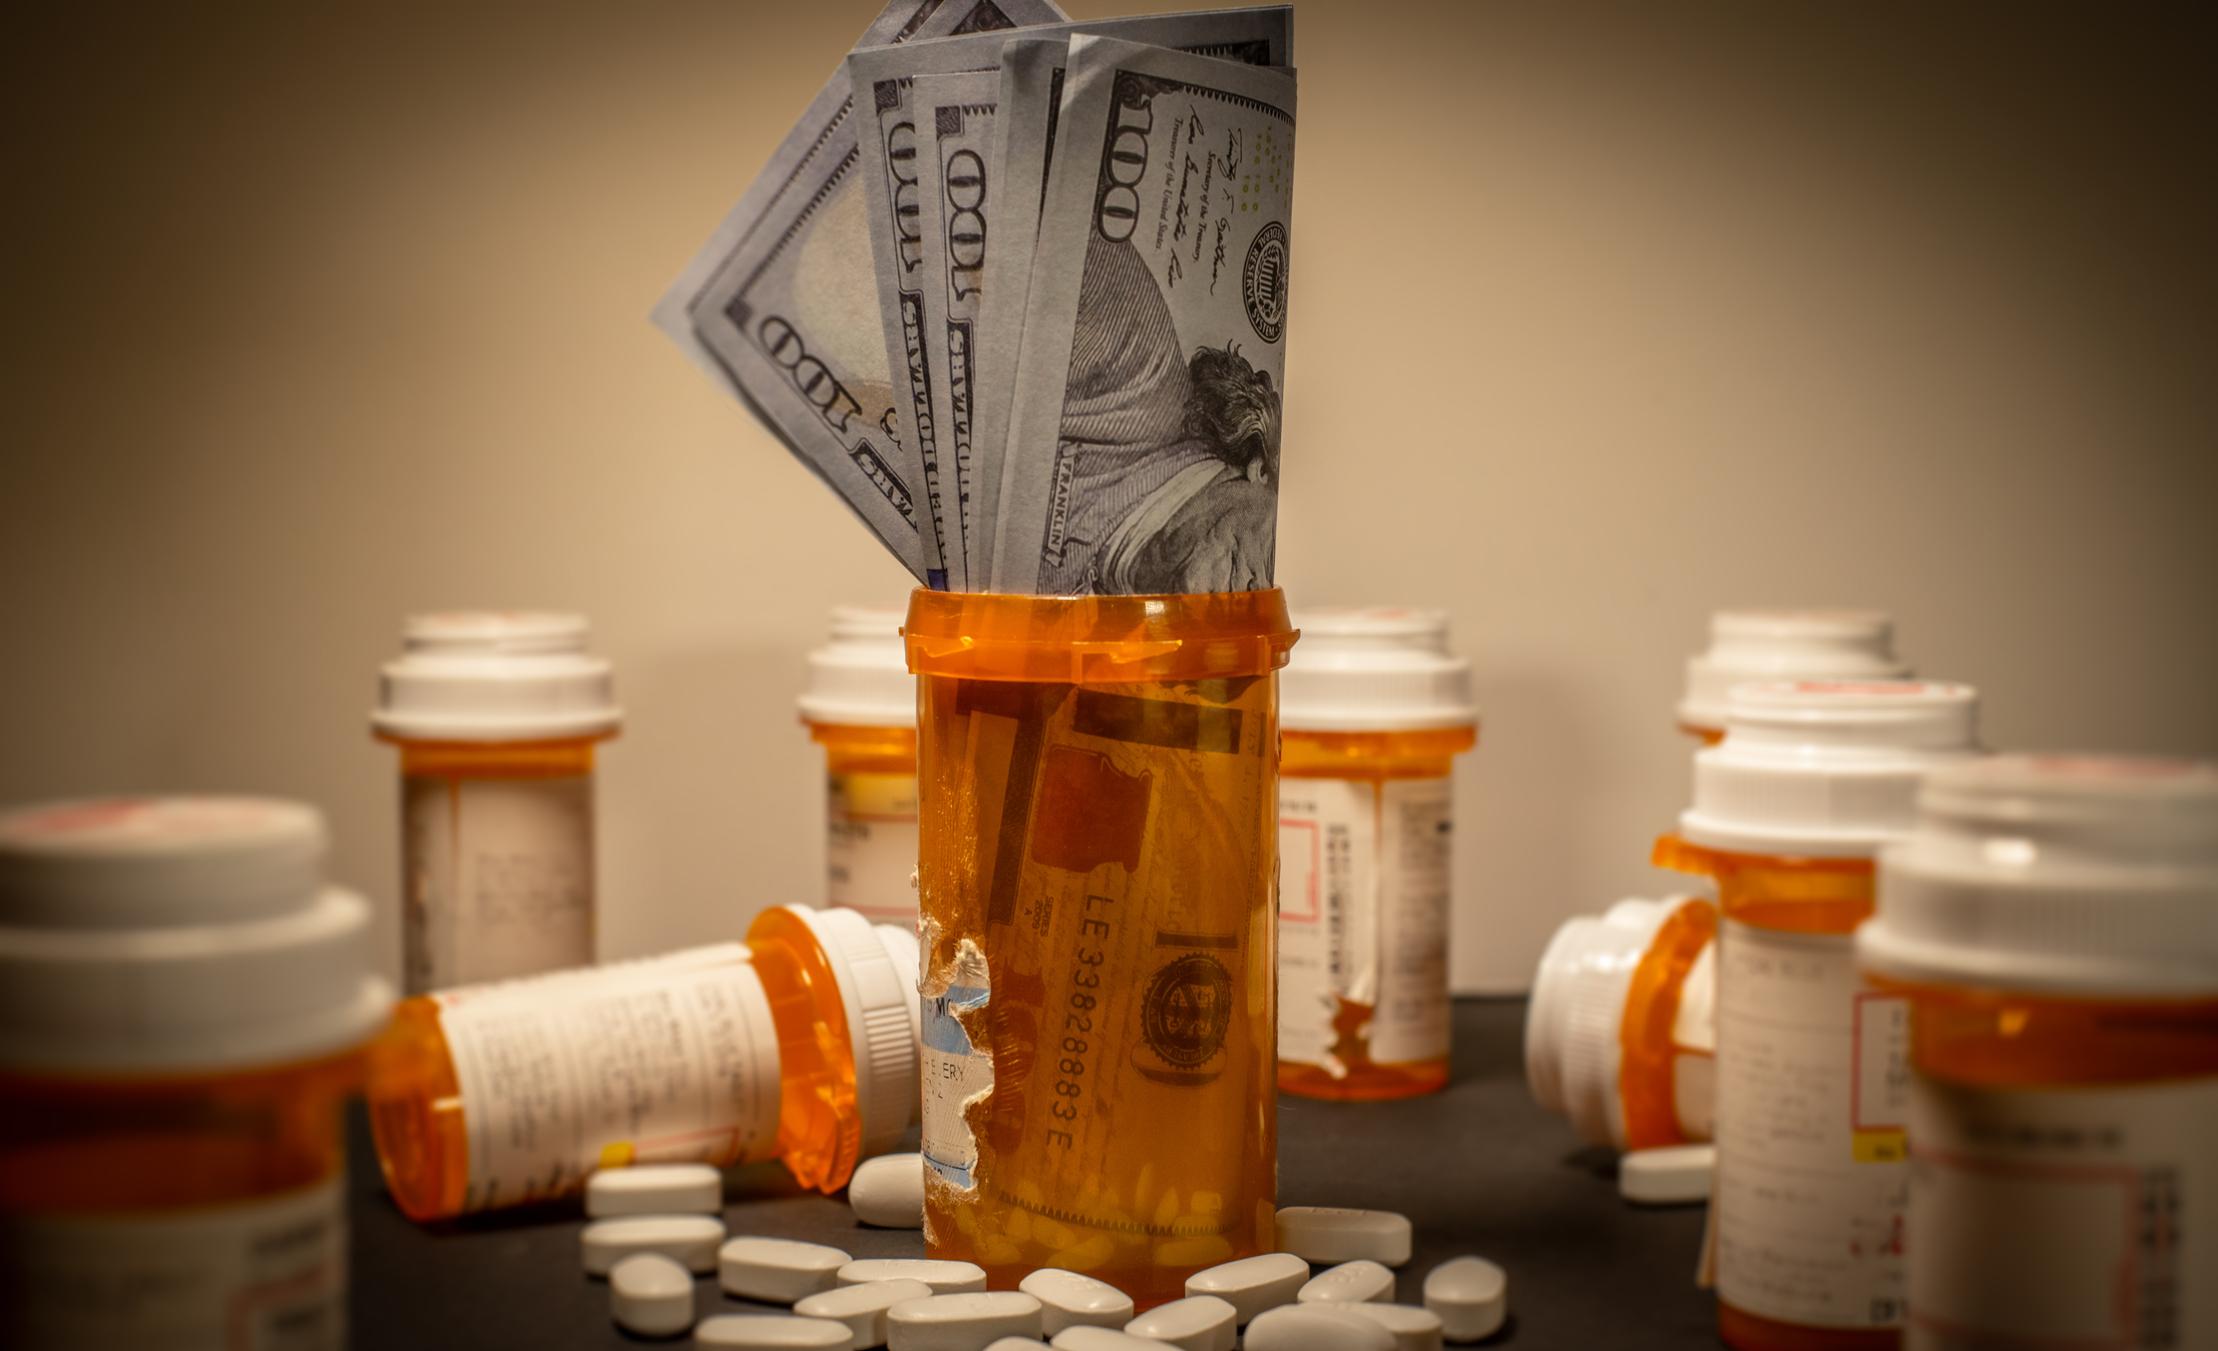 pill bottles with hundred dollar bills.'